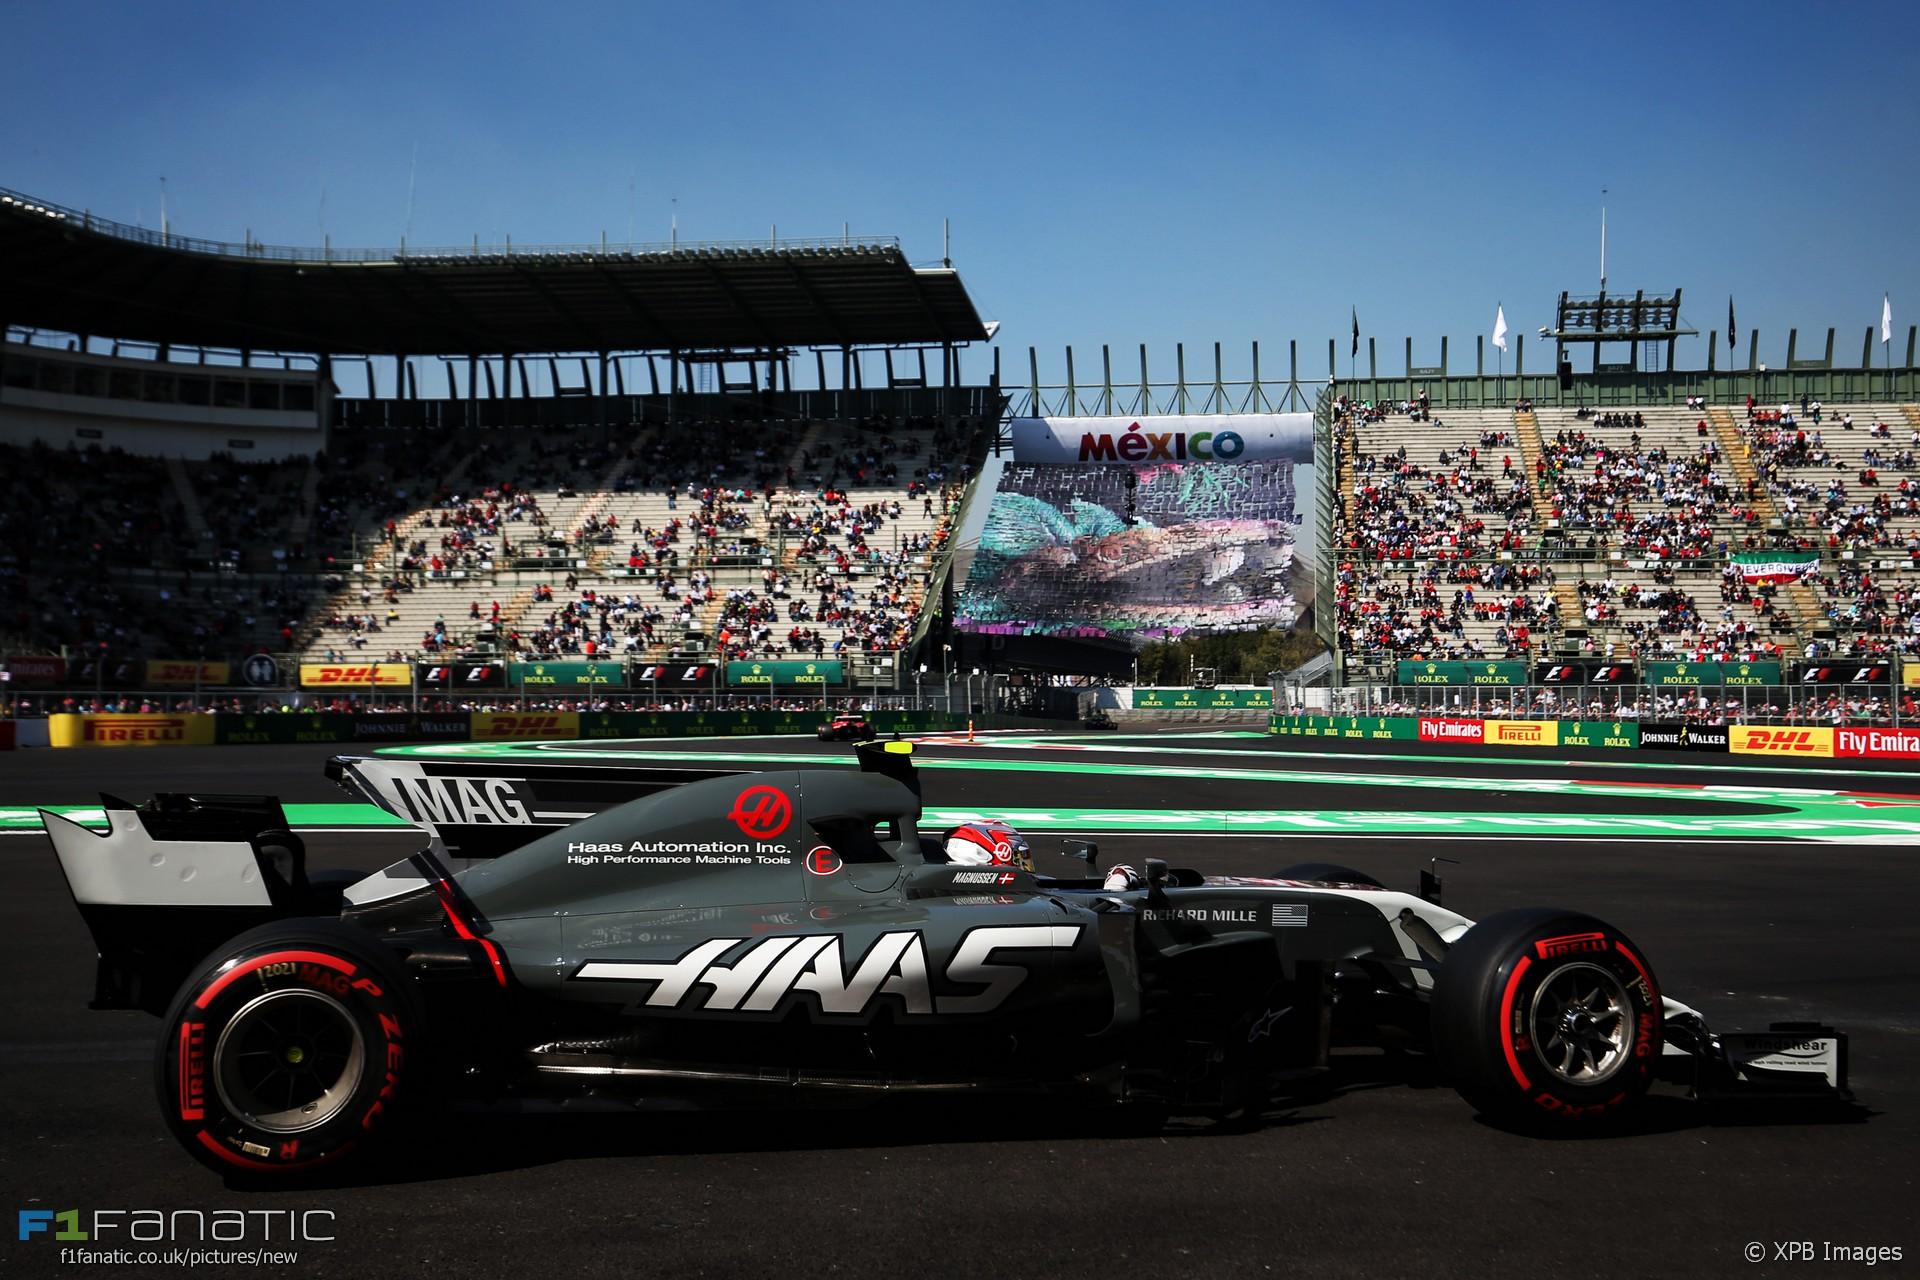 Kevin Magnussen, Haas, Autodromo Hermanos Rodriguez, 2017